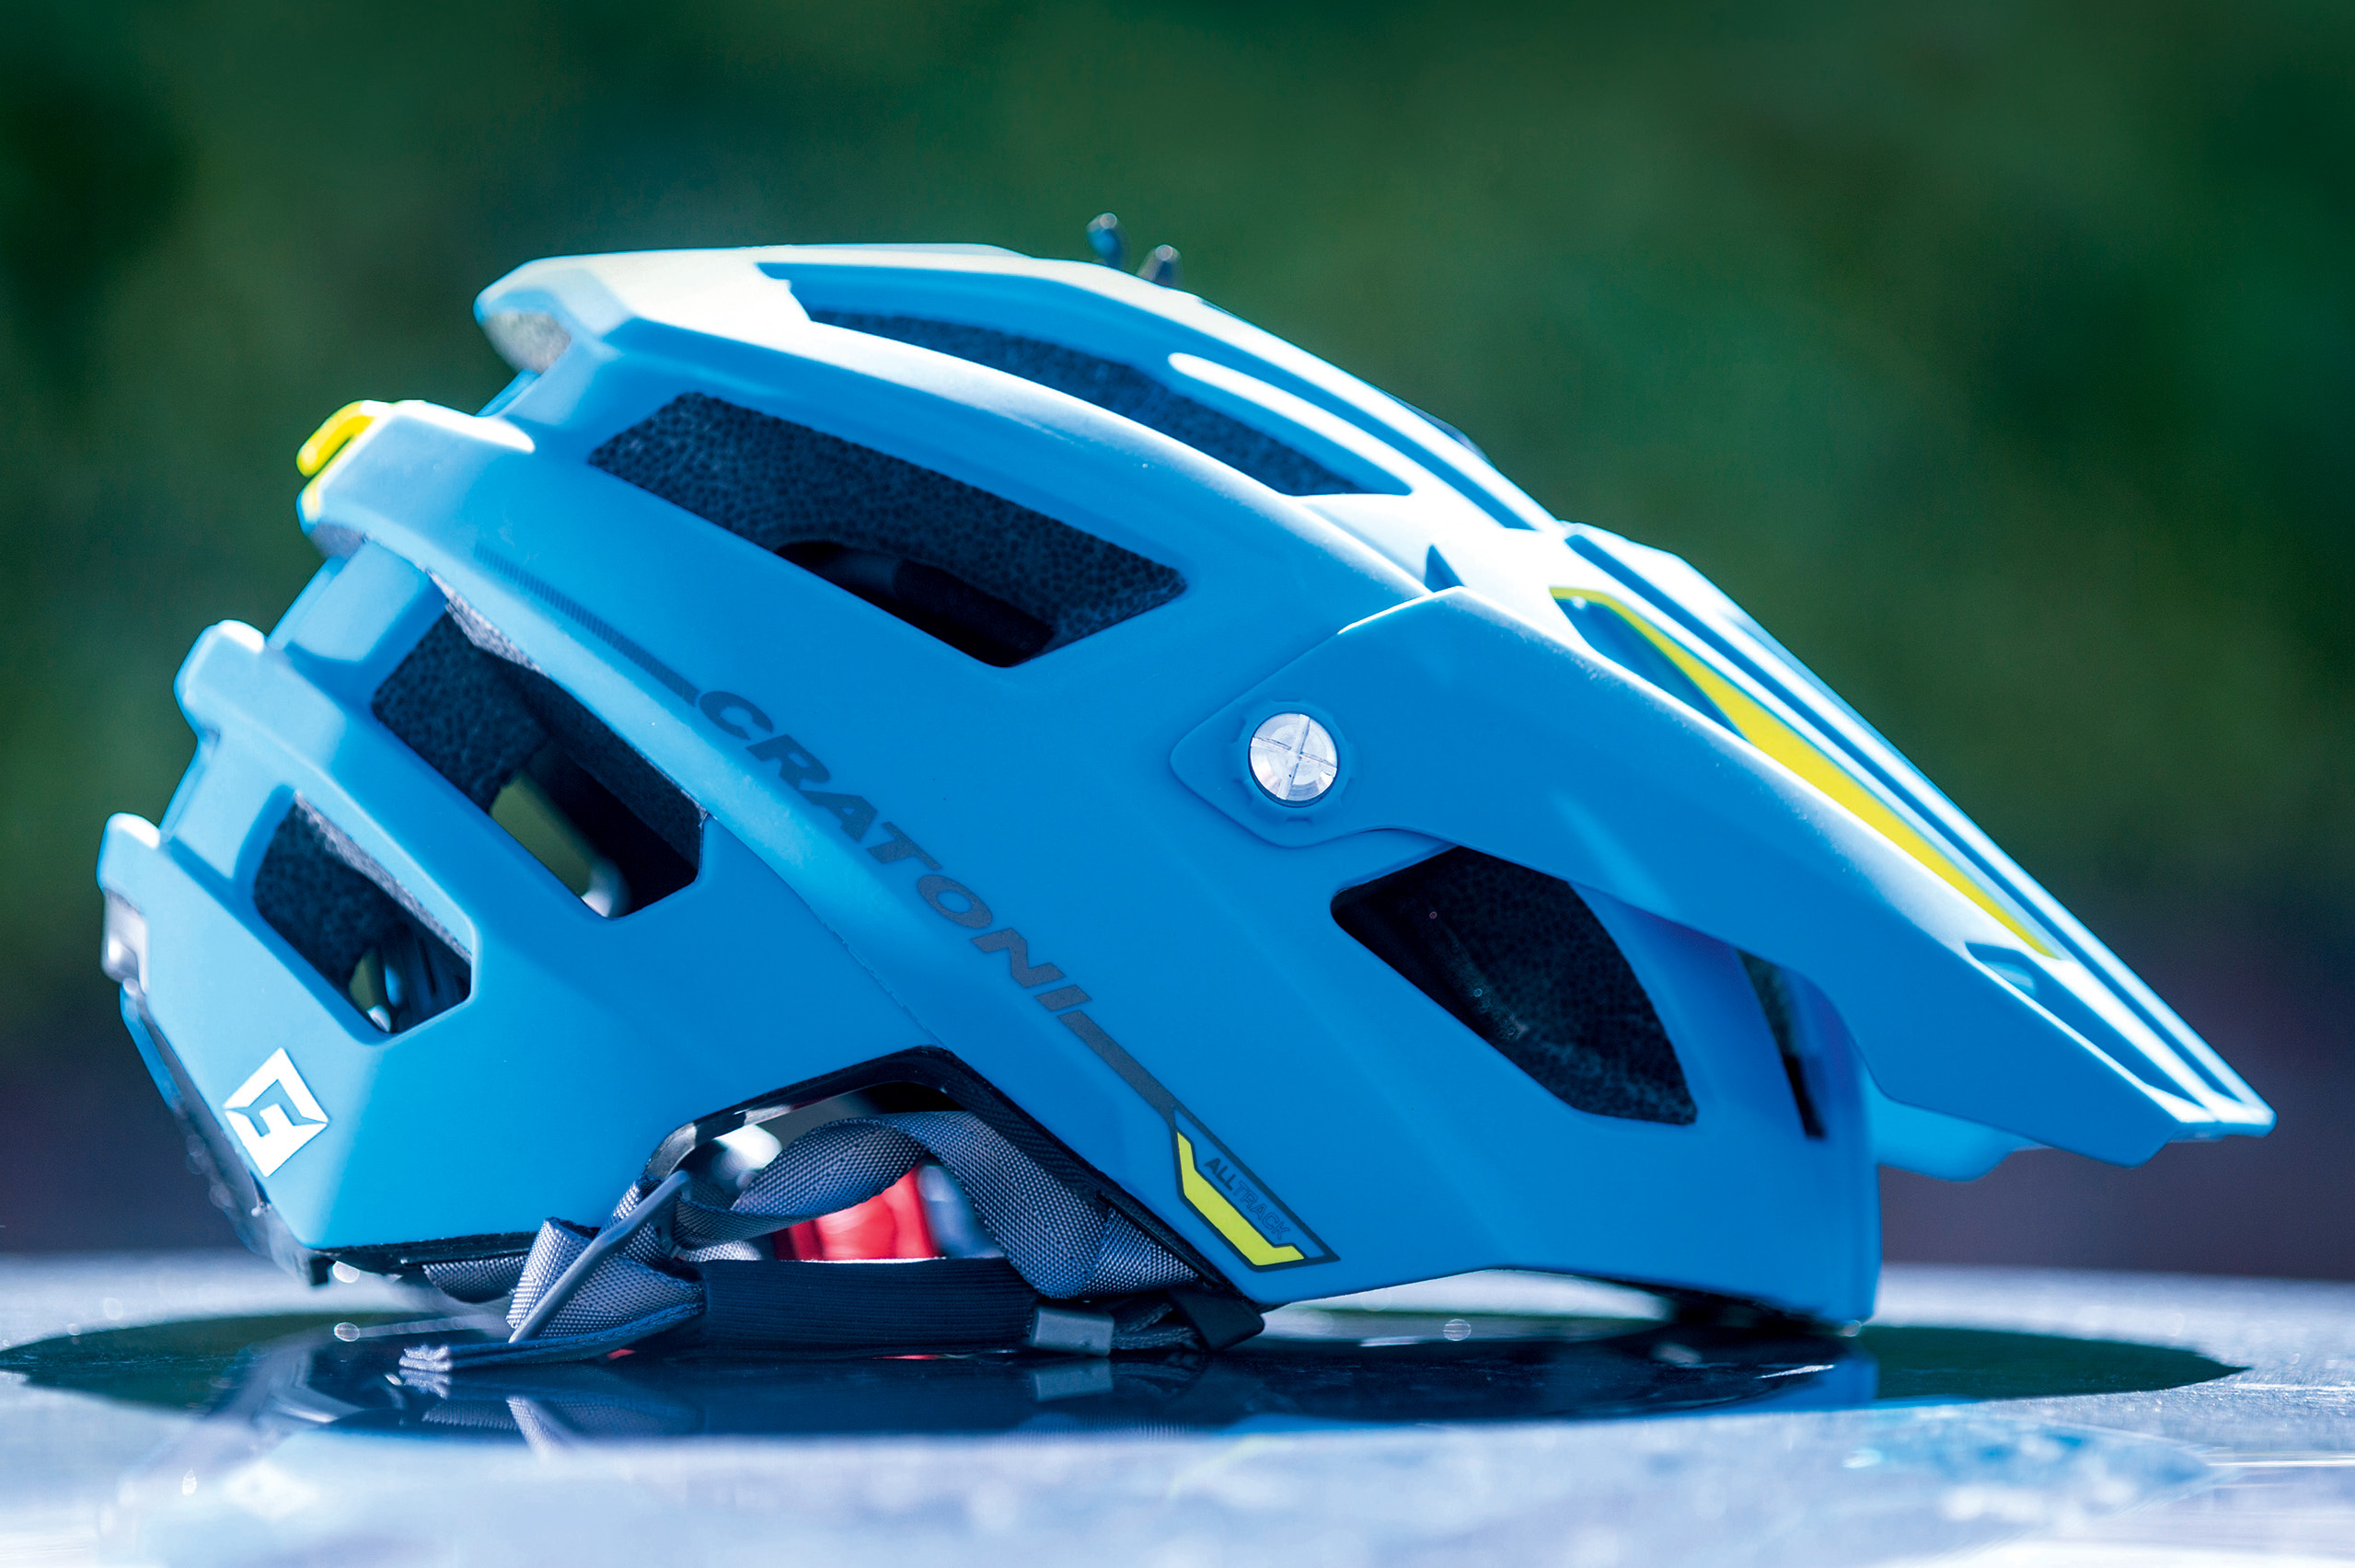 cratoni alltrack  Cratoni AllTrack helmet review - MBR